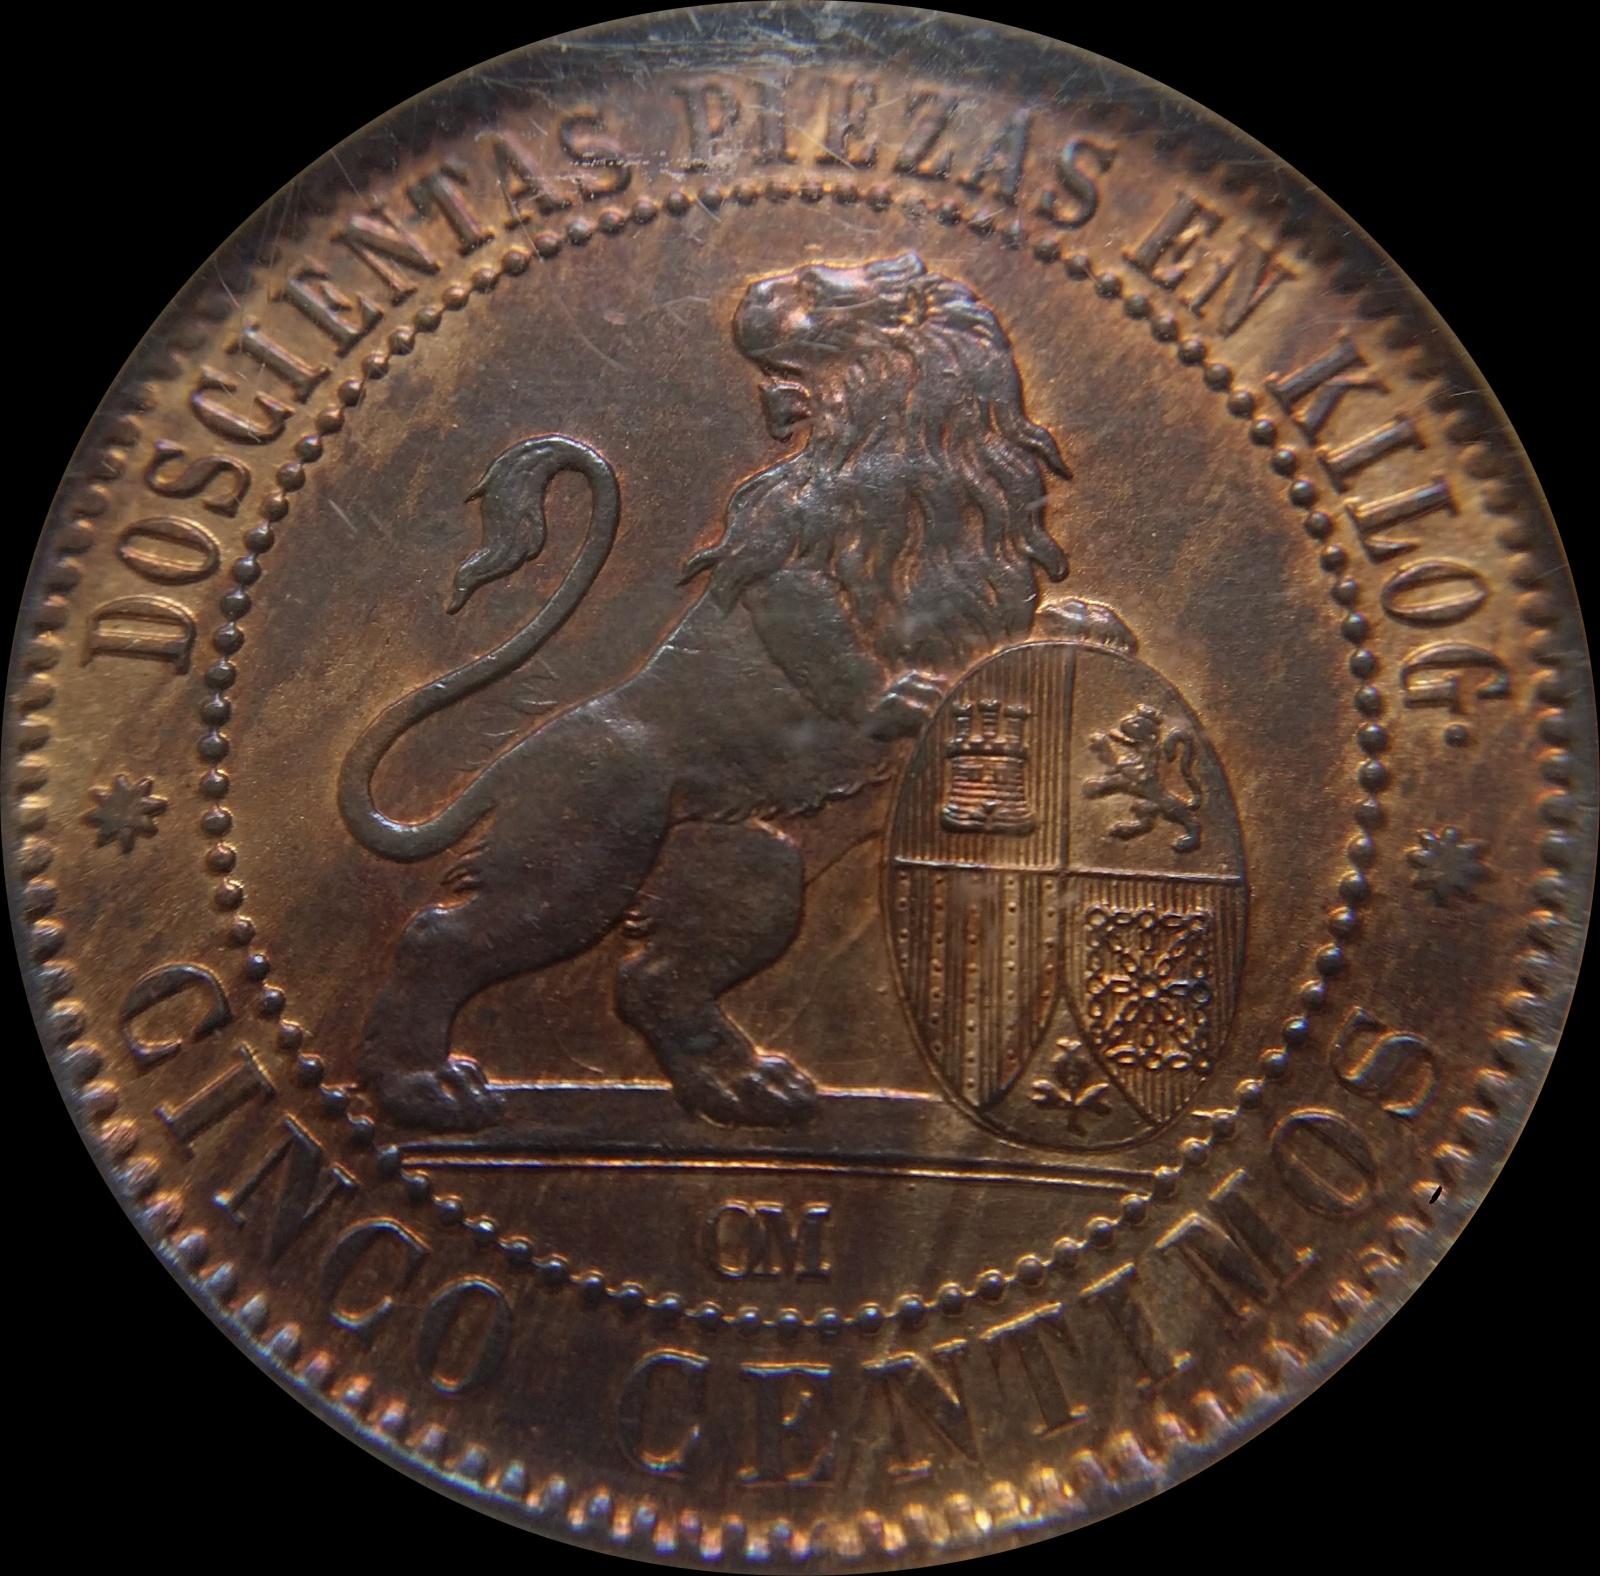 5 céntimos 1870 NGC MS 64 RB 1810ue